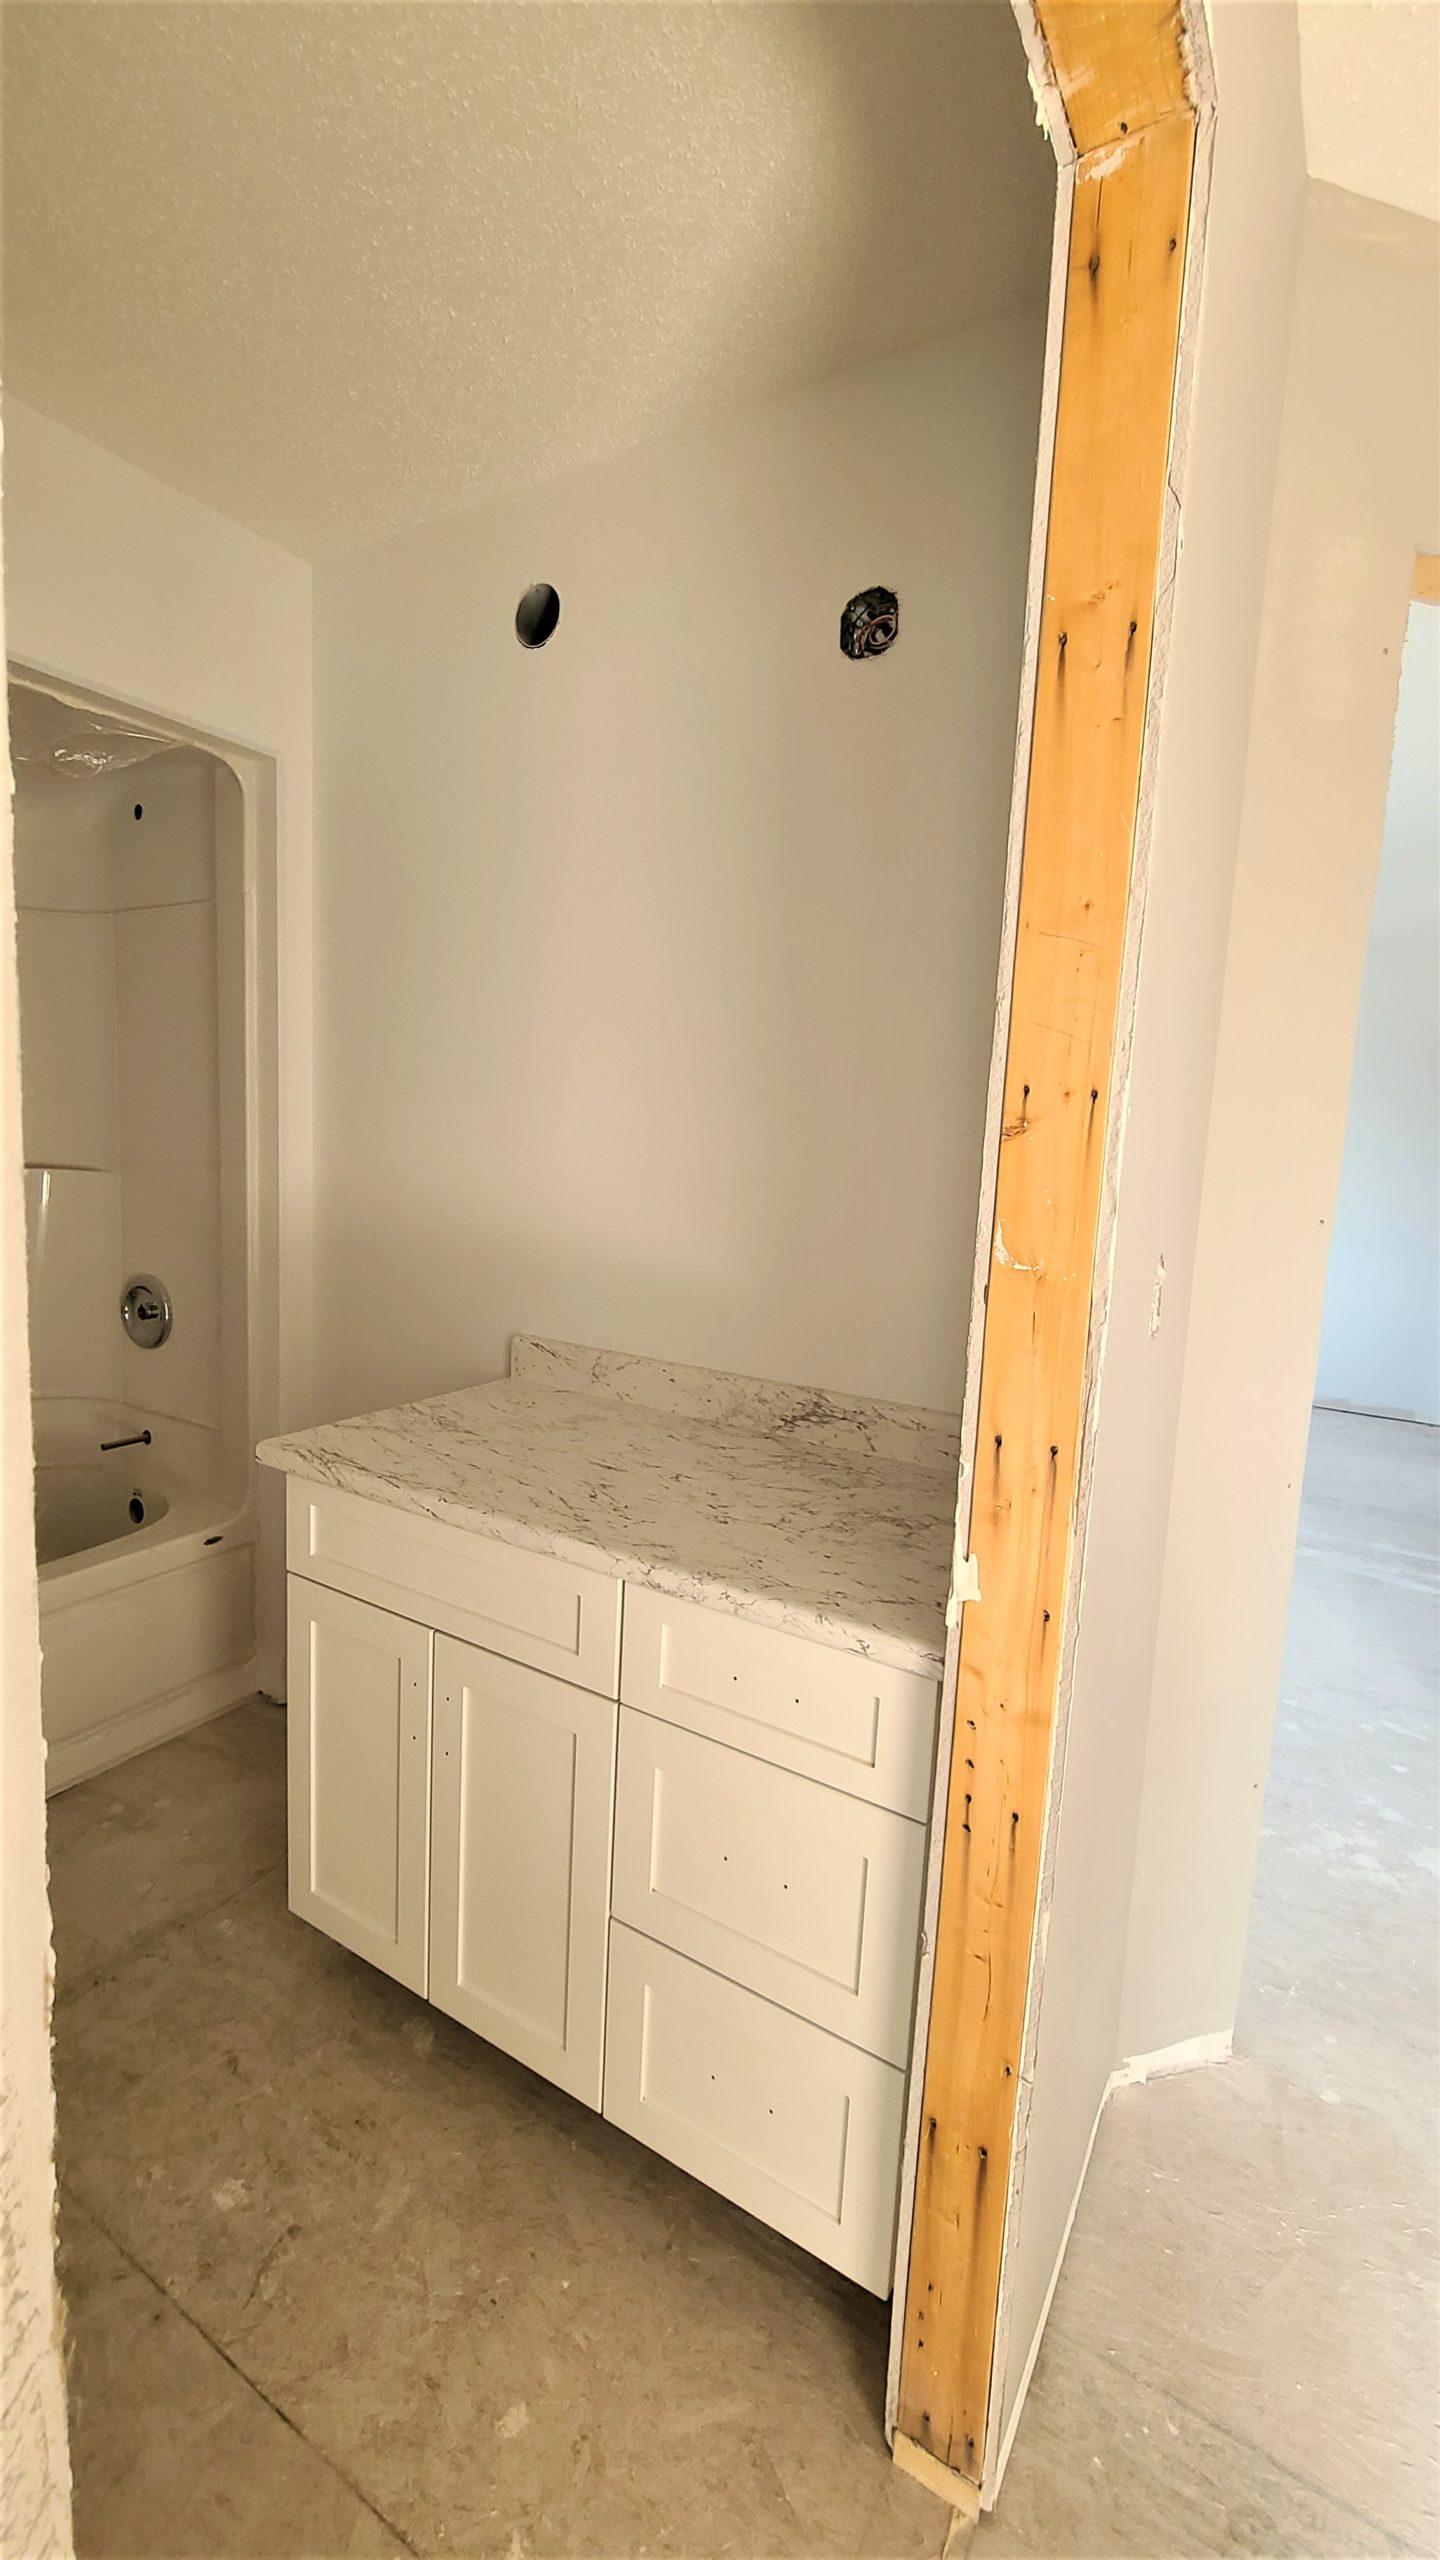 Main Bathroom - Cabinet RTM under construction